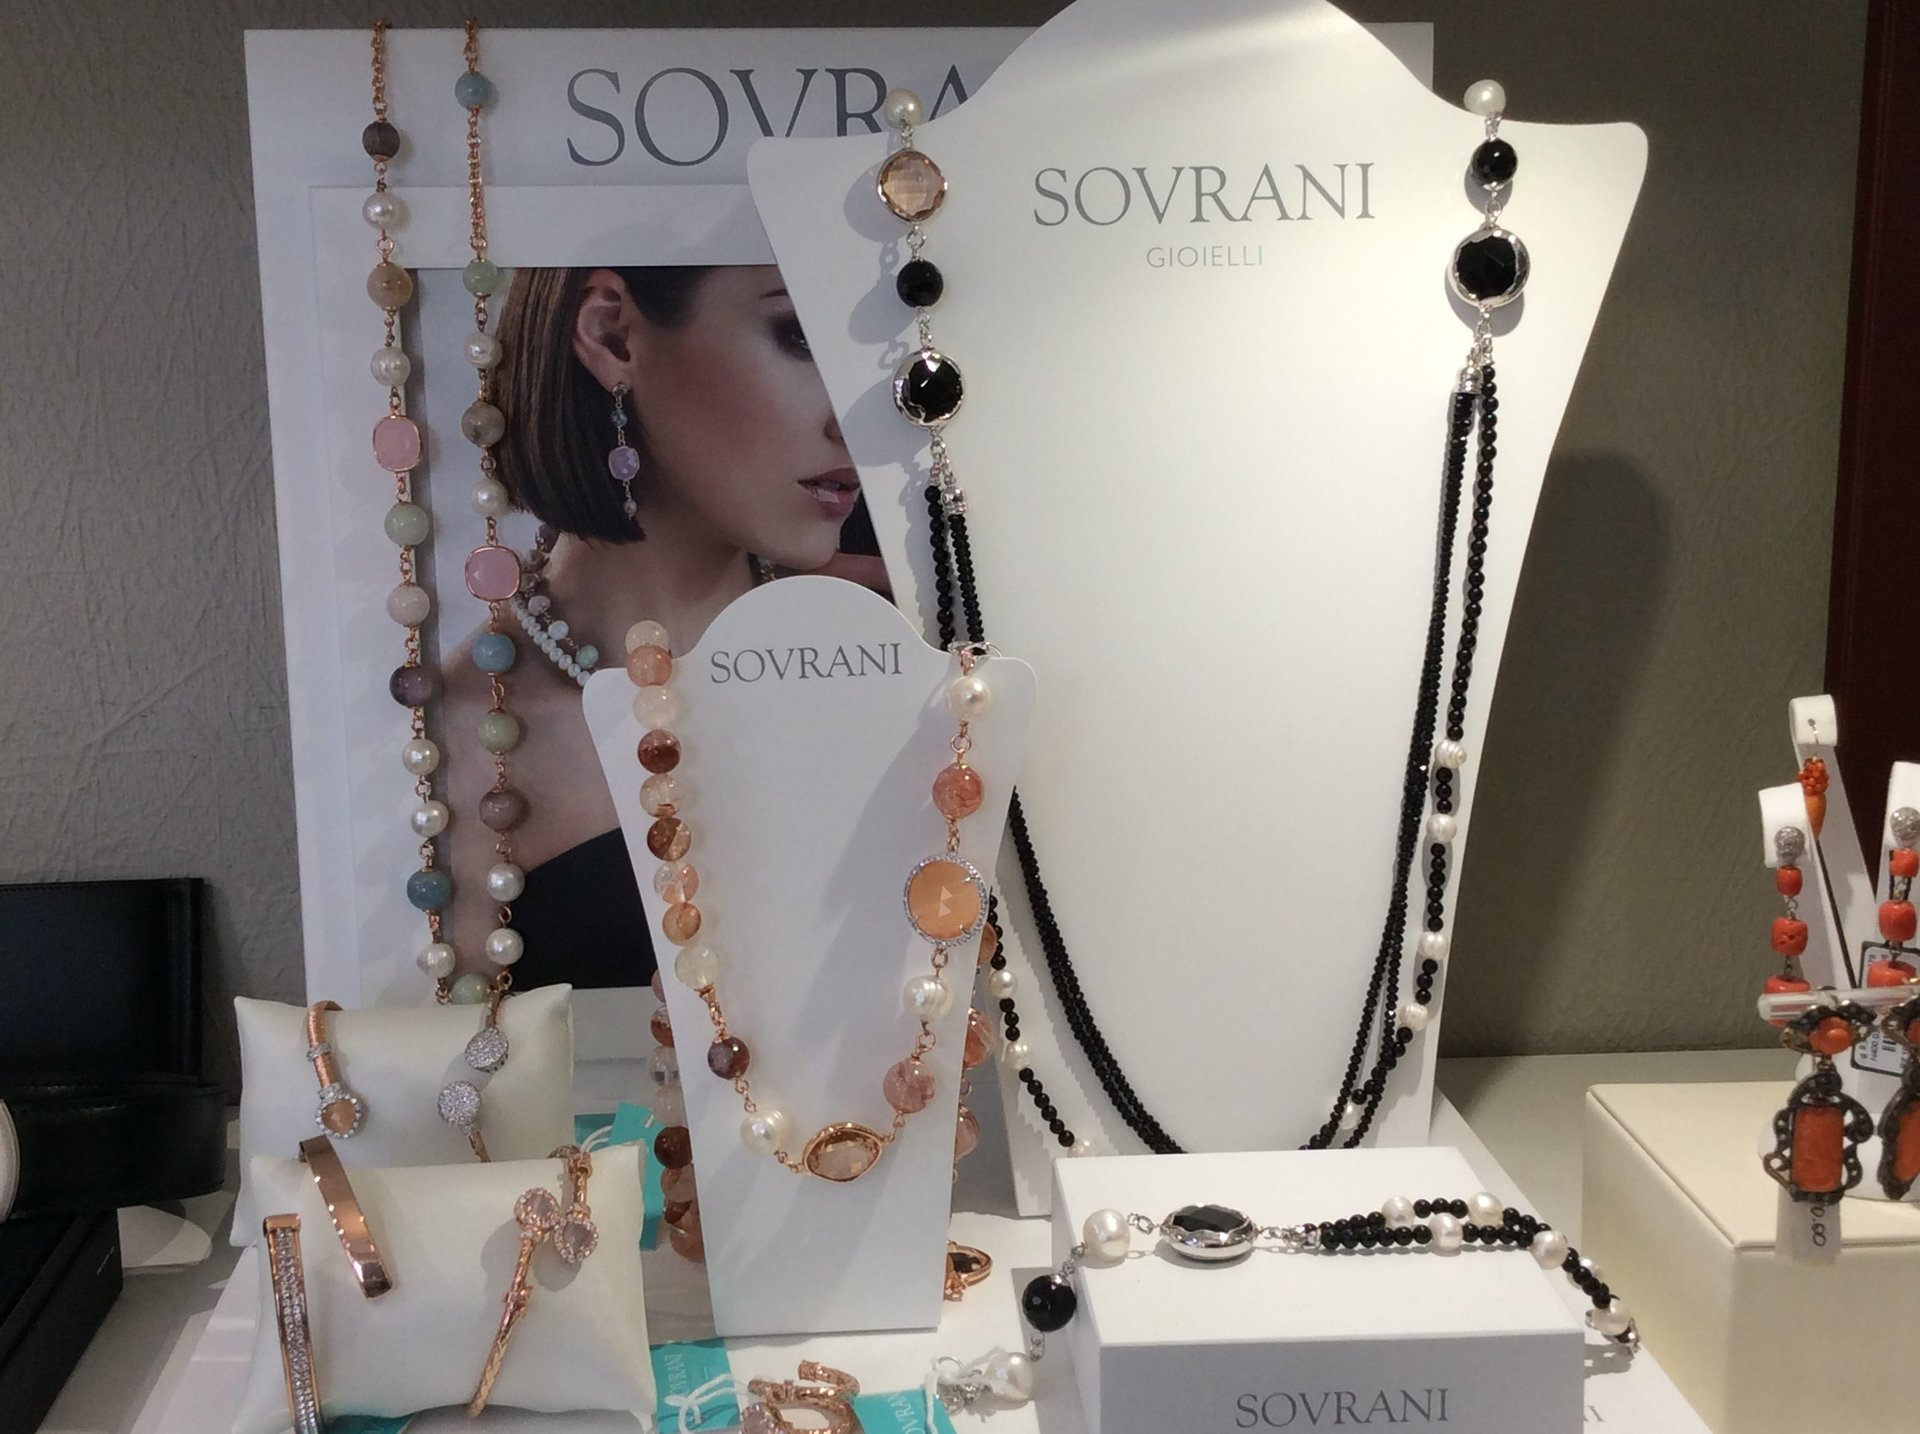 gioielli Sovrani